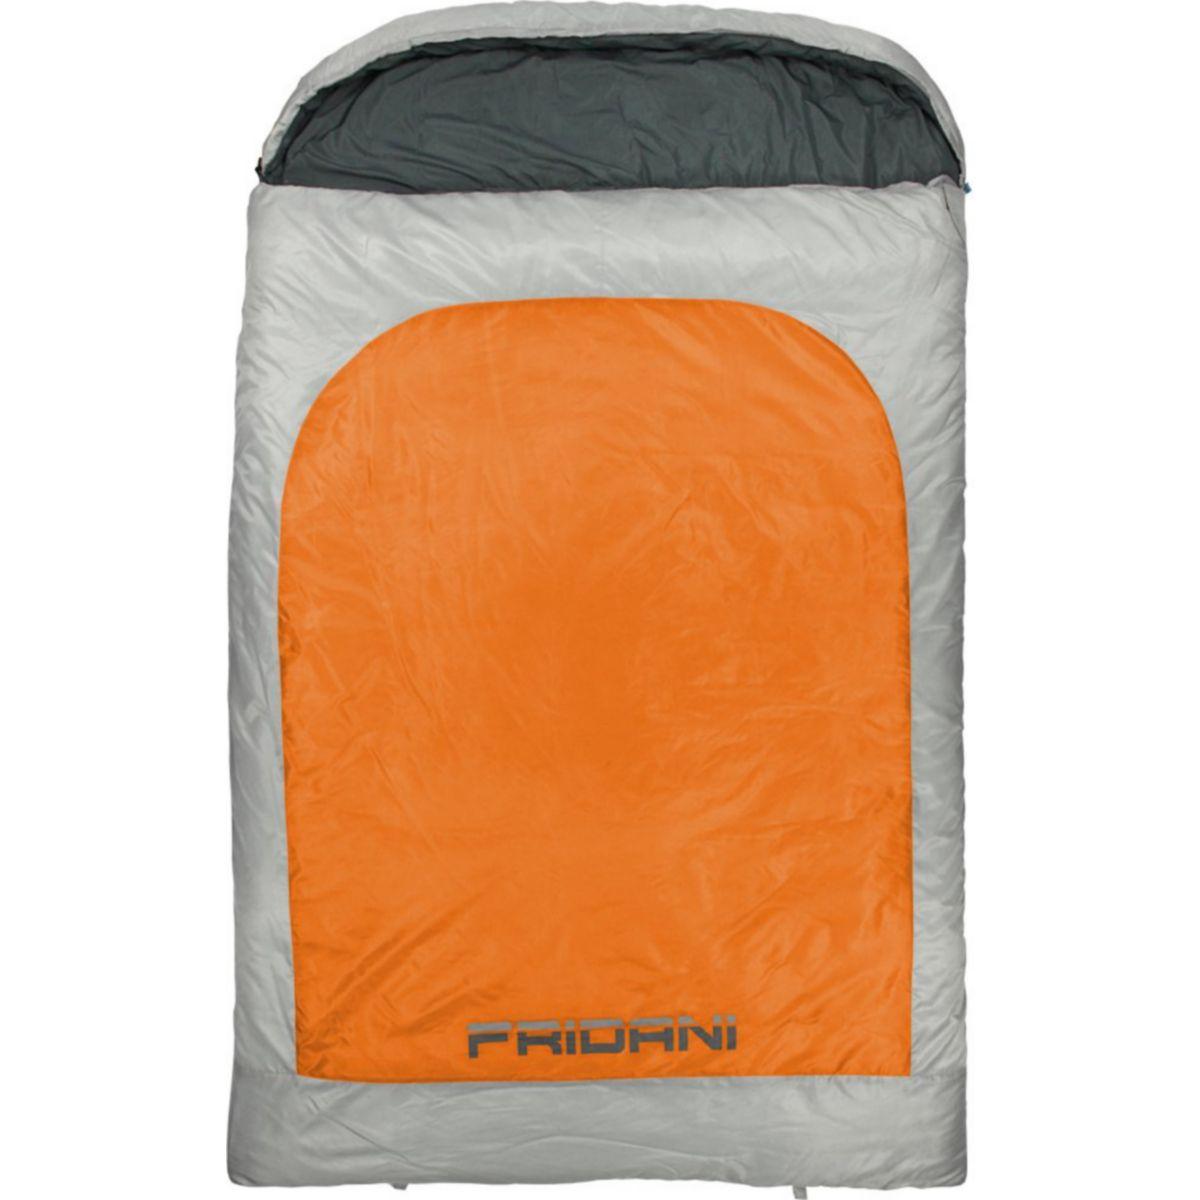 Fridani BO 235D Double - Decken-Schlafsack, 235x150cm, 3900 g, -22°C (ext), -5°C (lim), +1°C (comf)